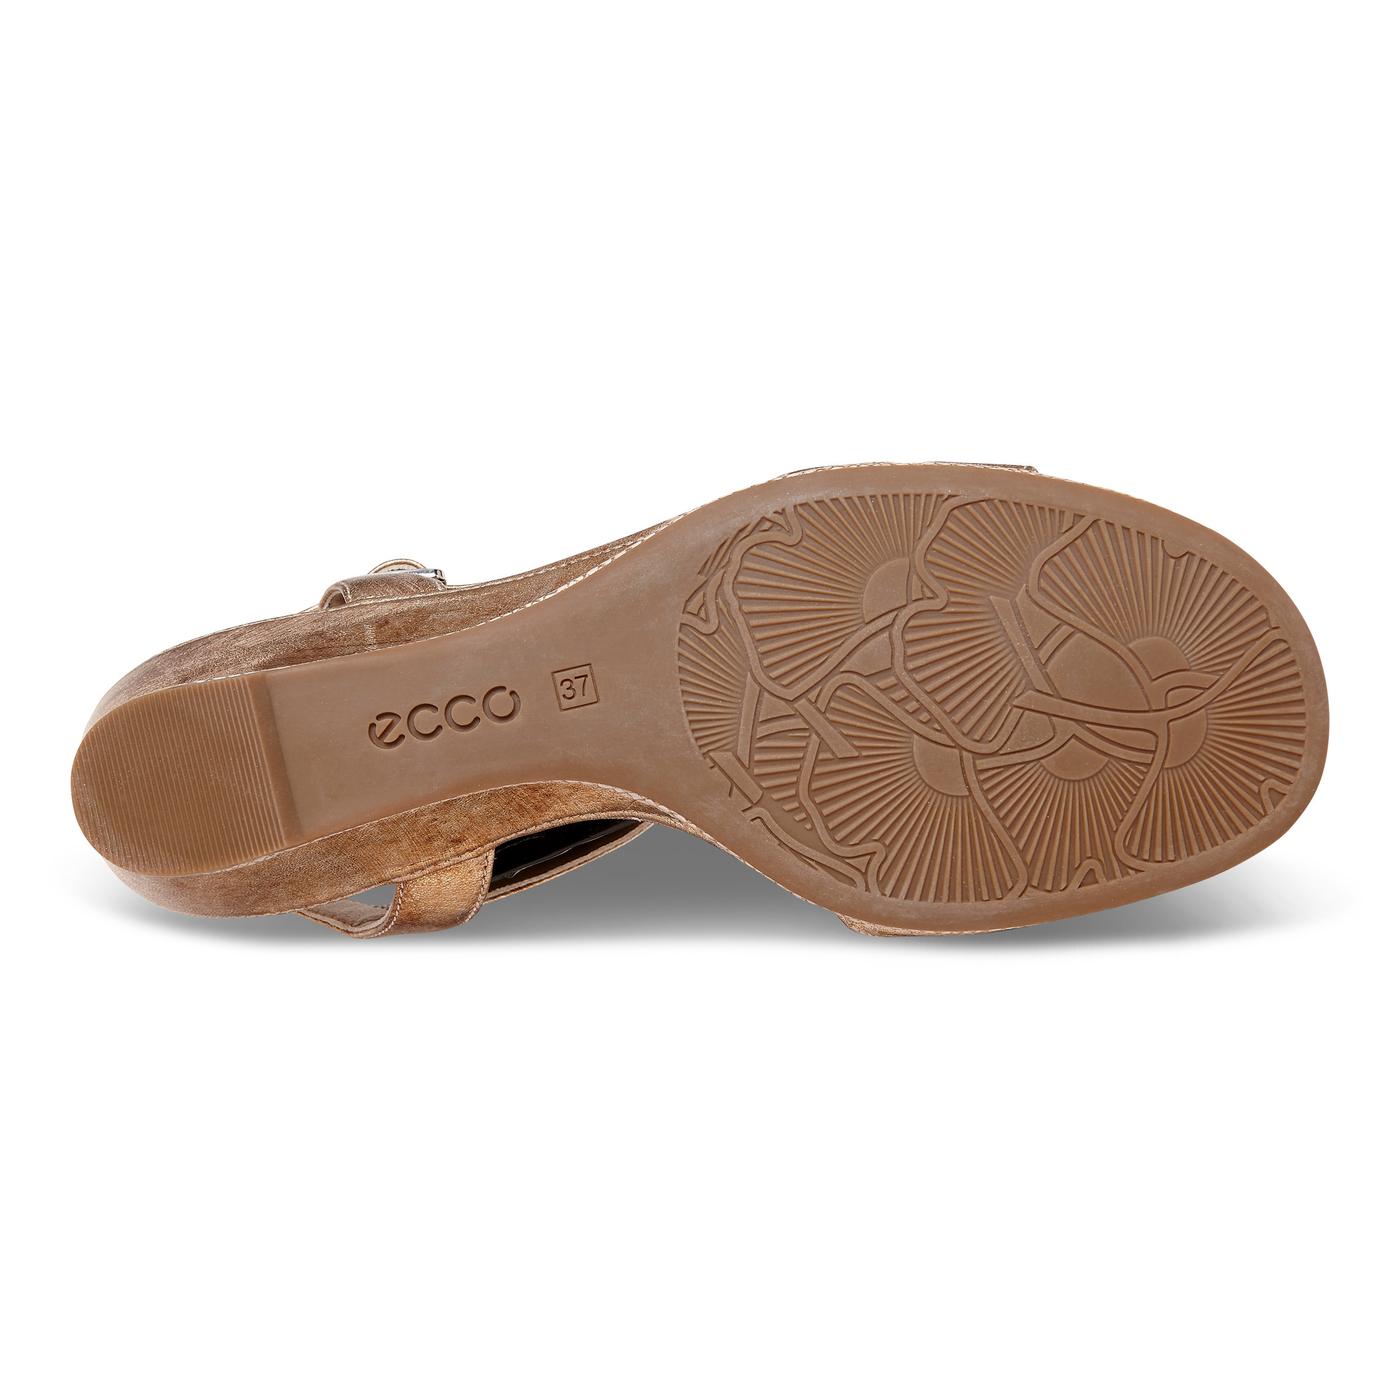 ECCO RIVAS II 45mm Strap Sandal